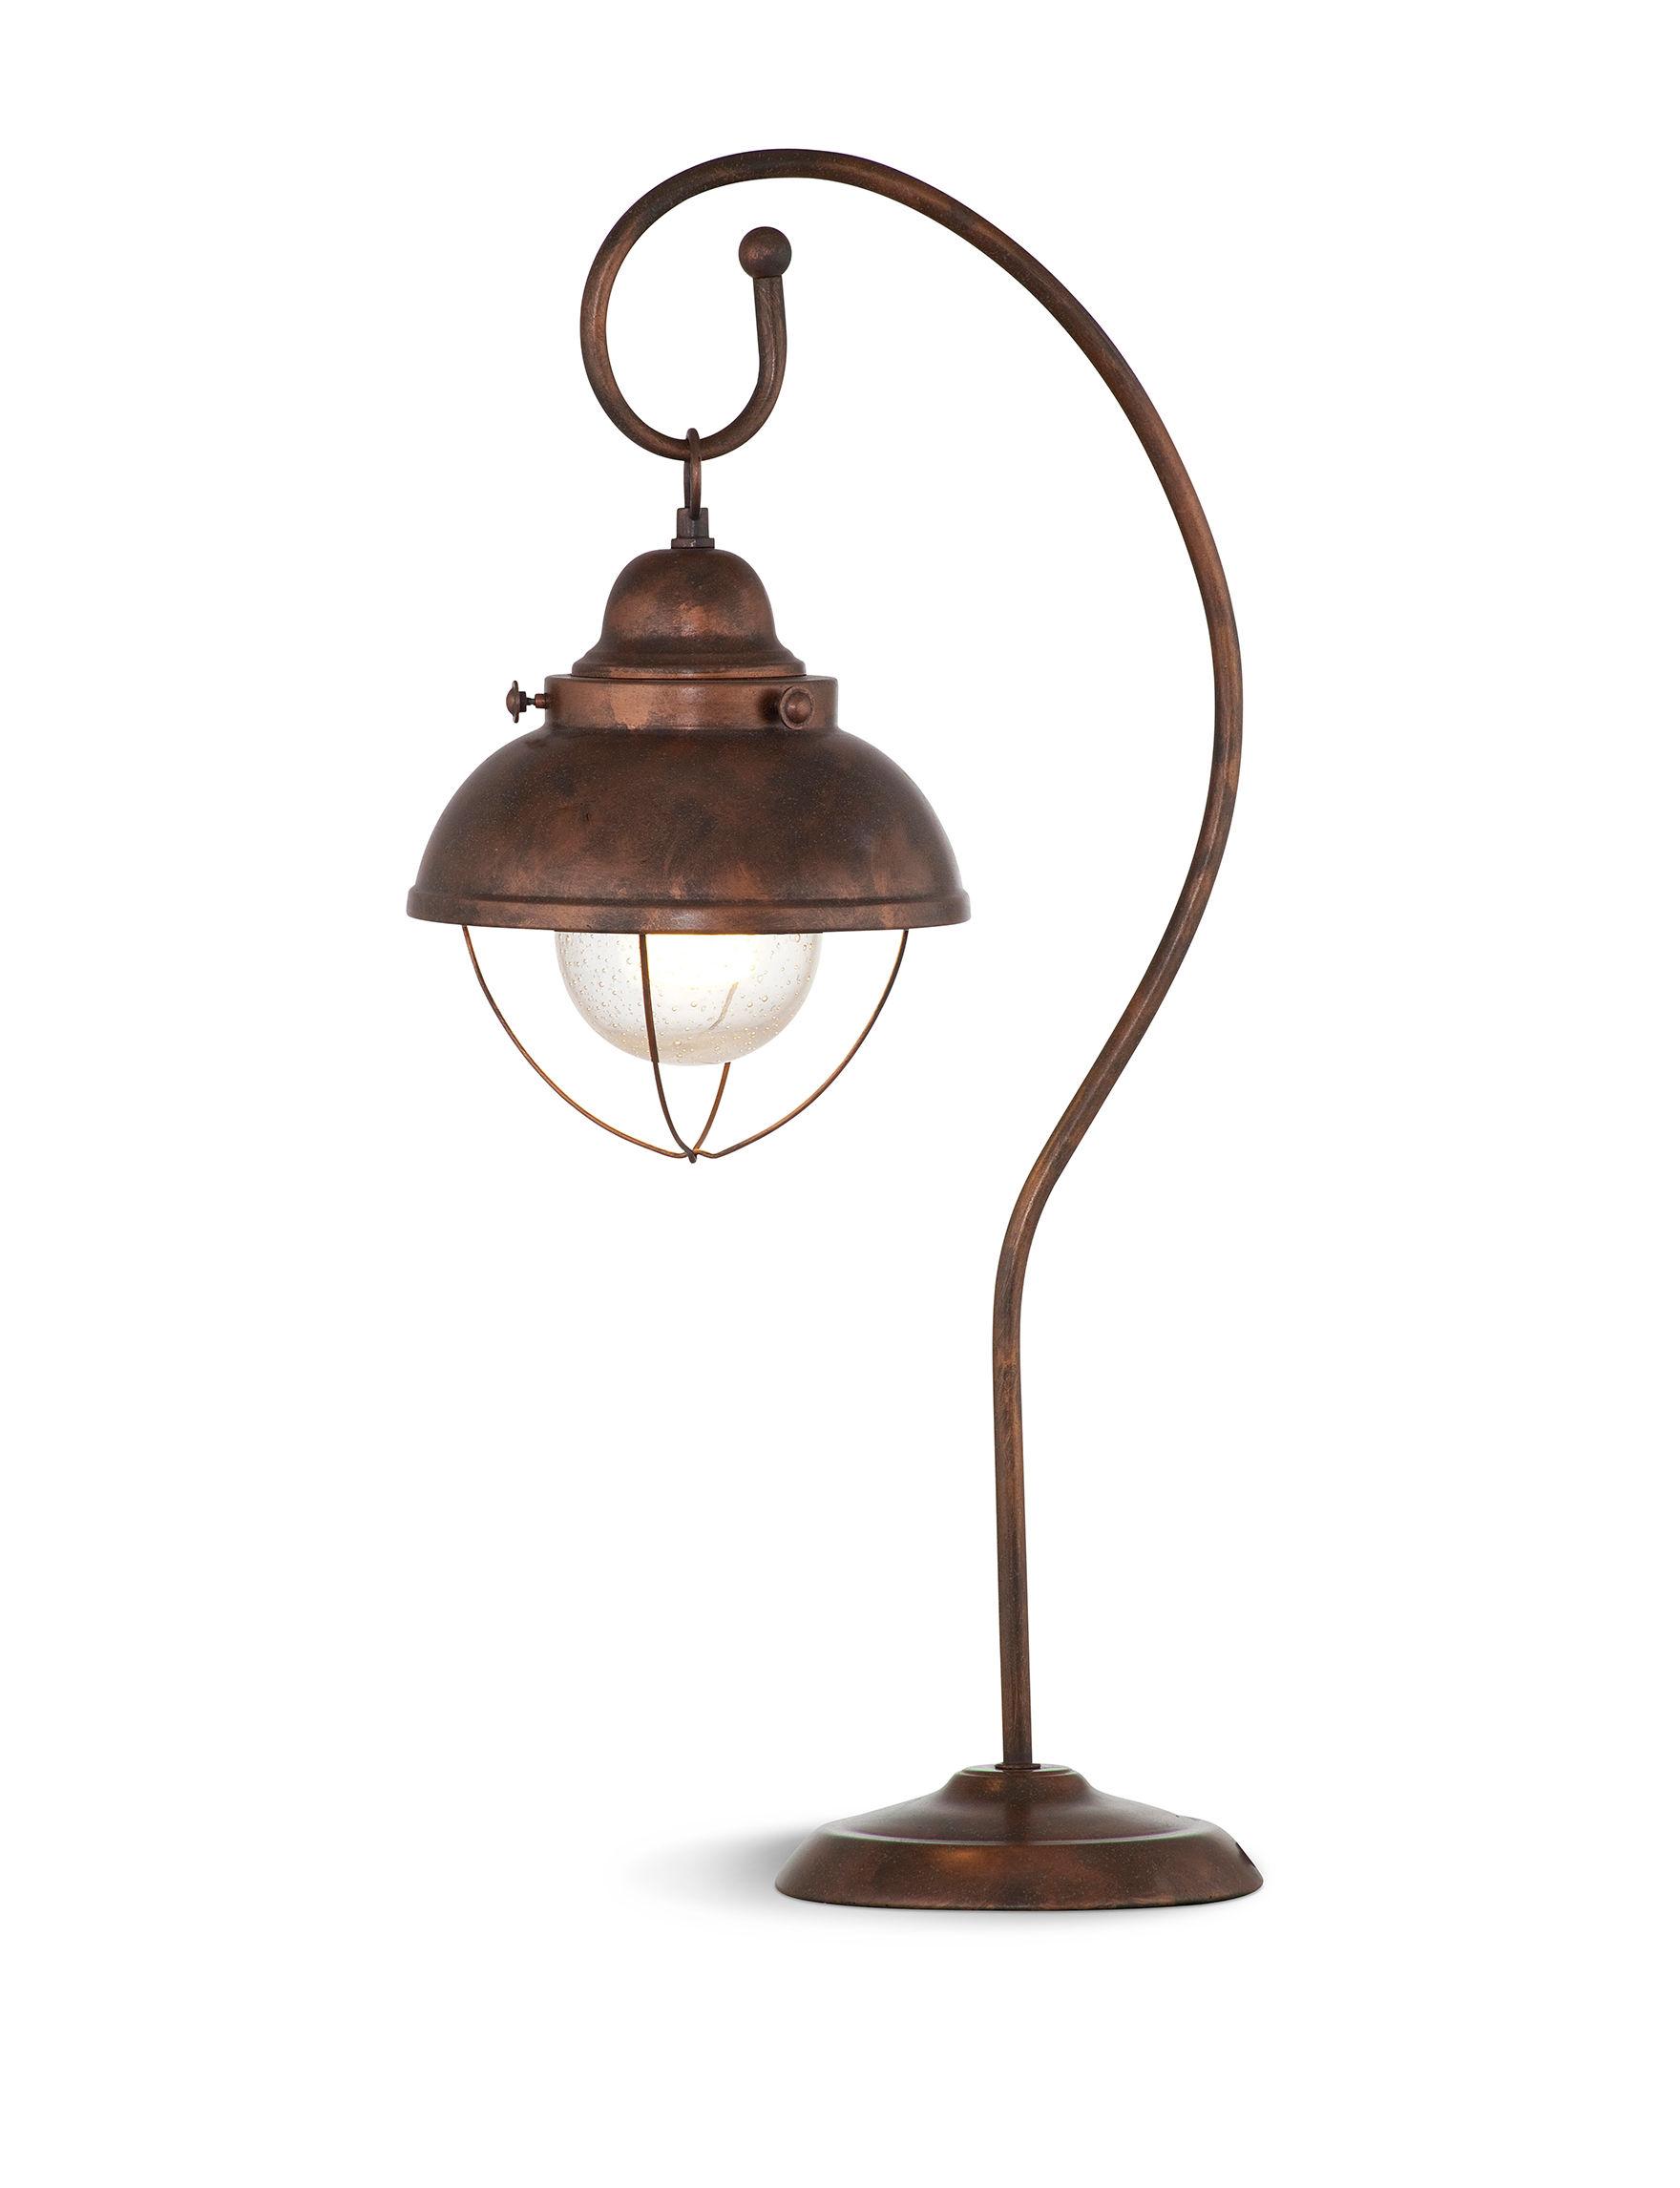 Bassett Mirror Co. Copper Table Lamps Lighting & Lamps